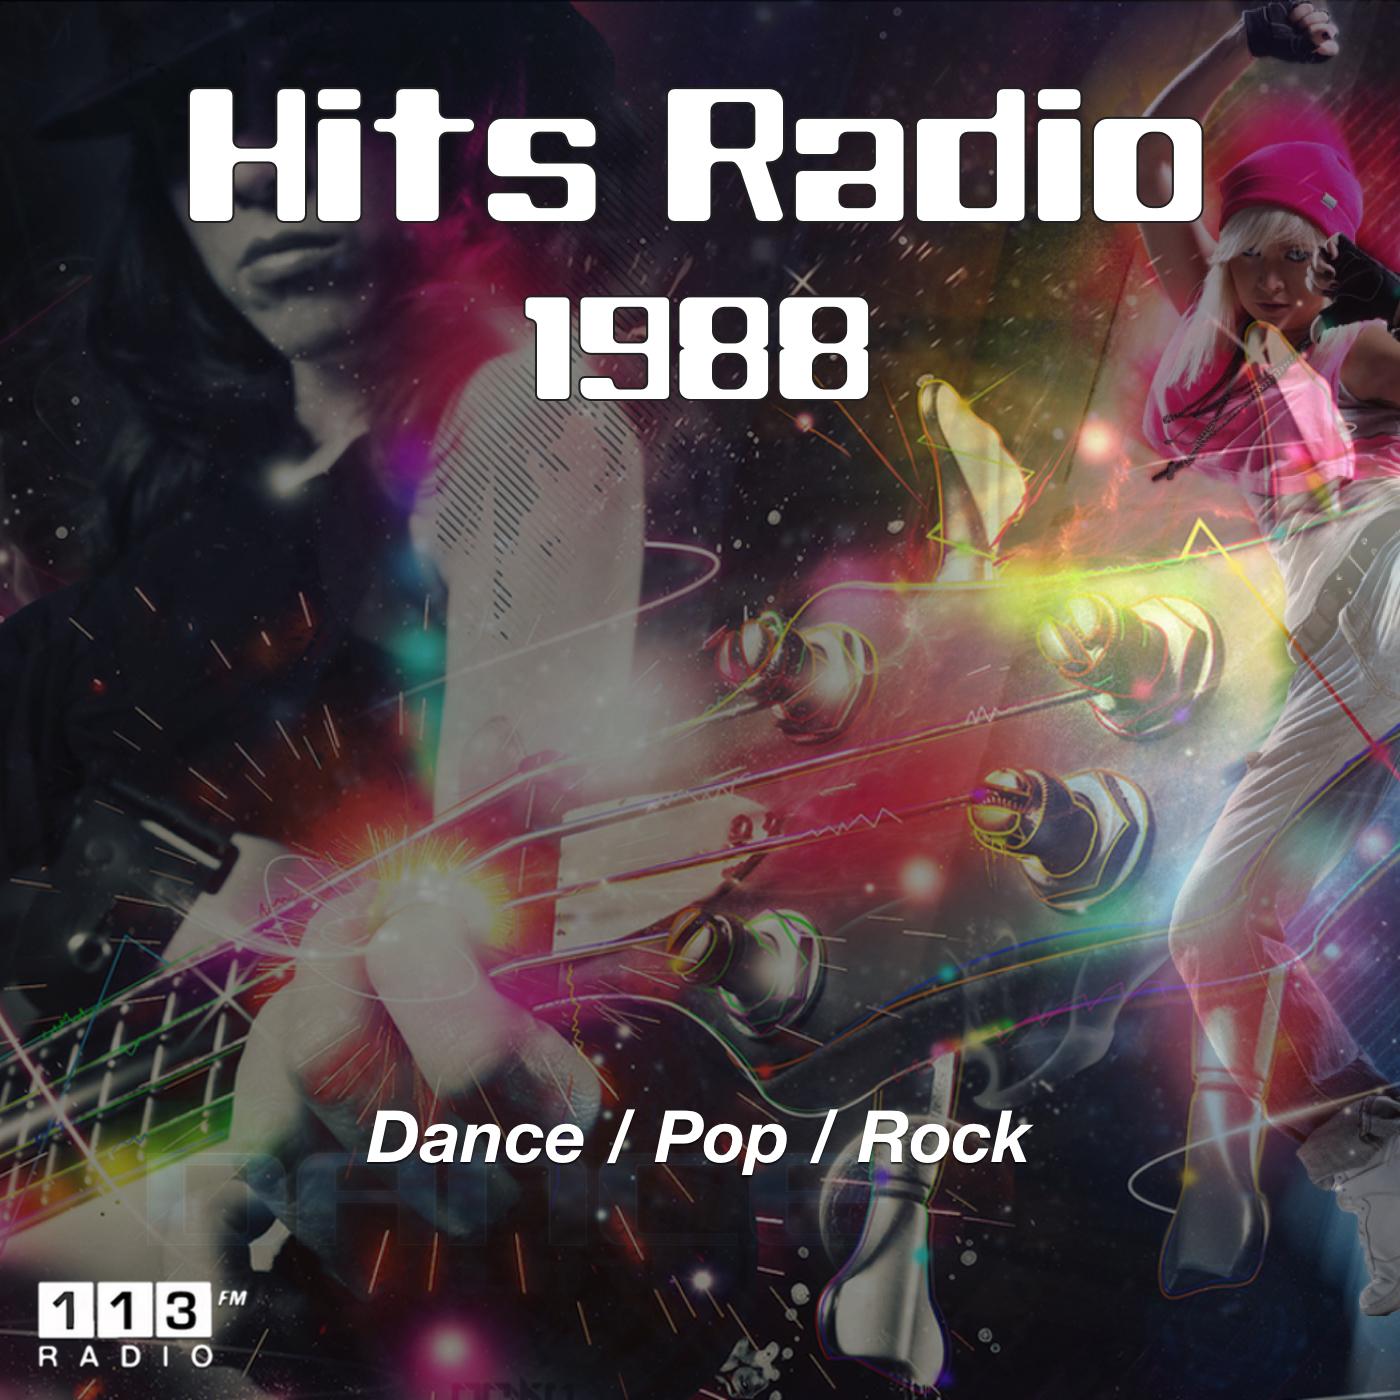 113.fm Hits Radio - 1988